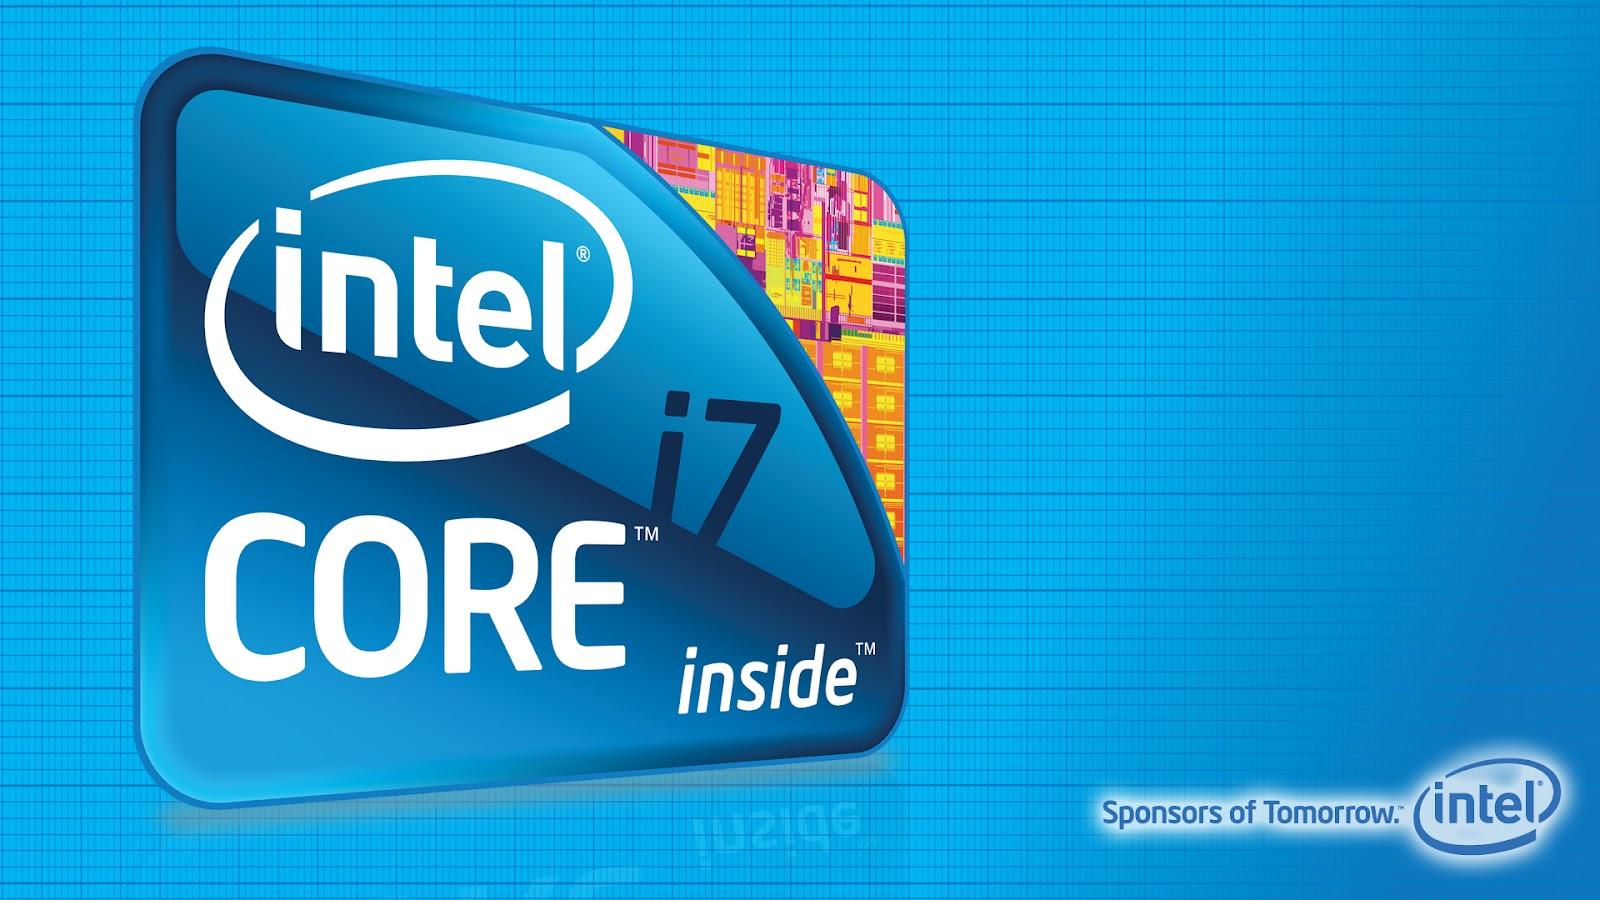 http://4.bp.blogspot.com/-KRzjSACe-lU/TzR04XIfcFI/AAAAAAAAFA4/30KPLZw1ETw/s1600/Intel+Core+i7+Wallpaper+1.jpg